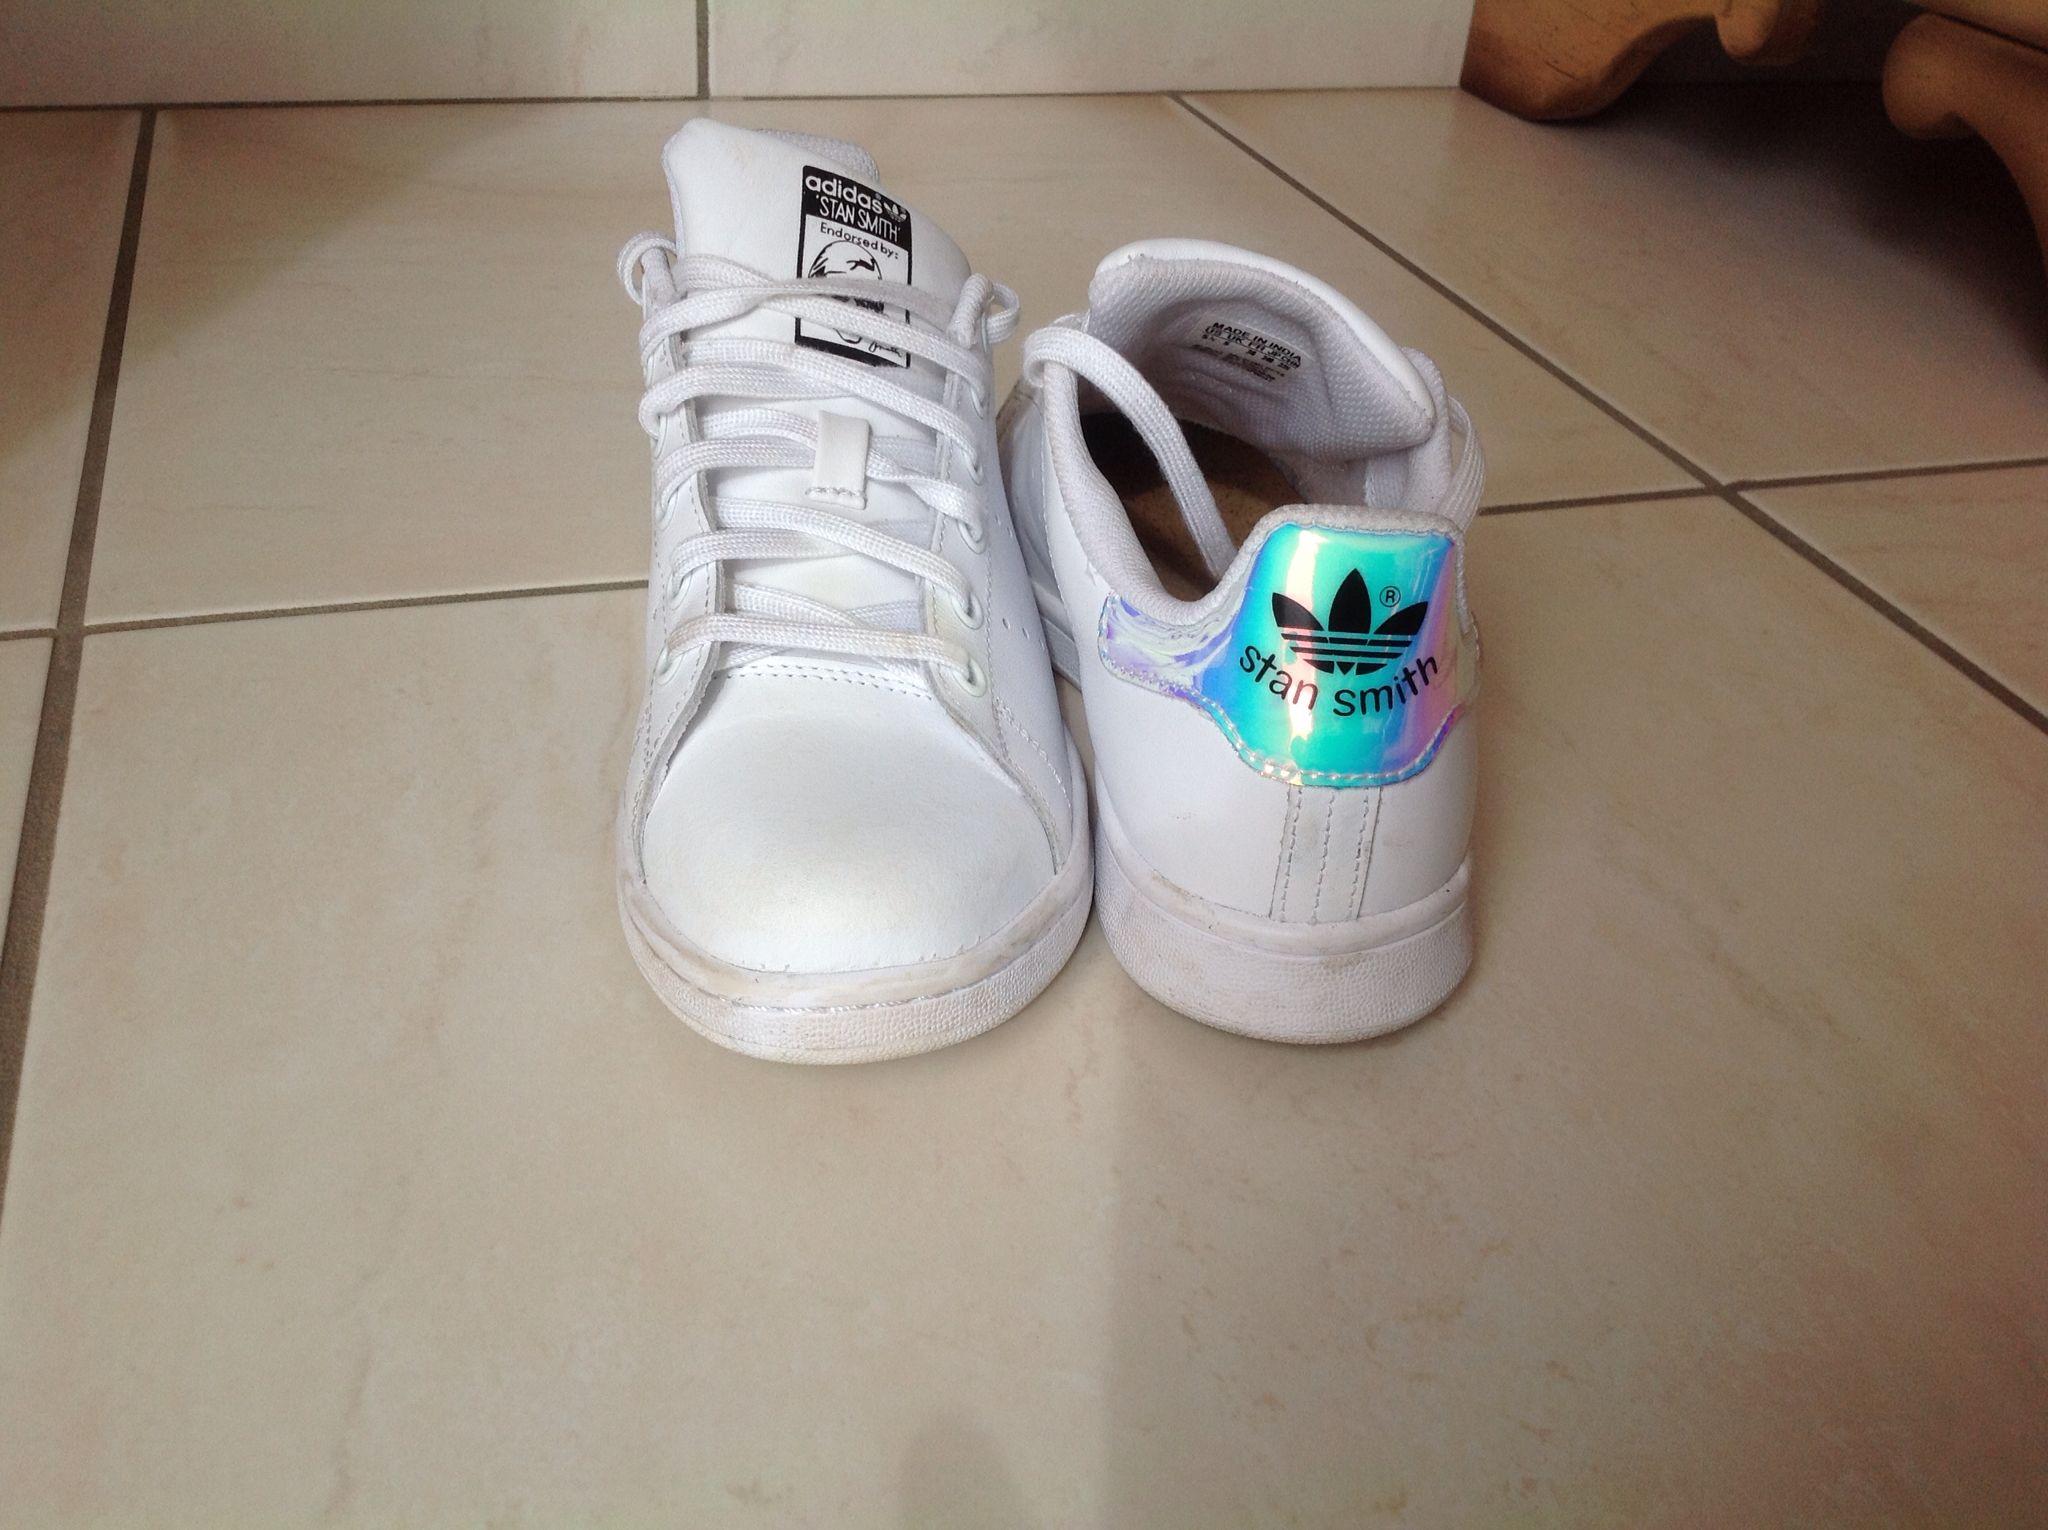 Stan Smith couleur miroir   Sneakers fashion, Sneakers, Adidas ...